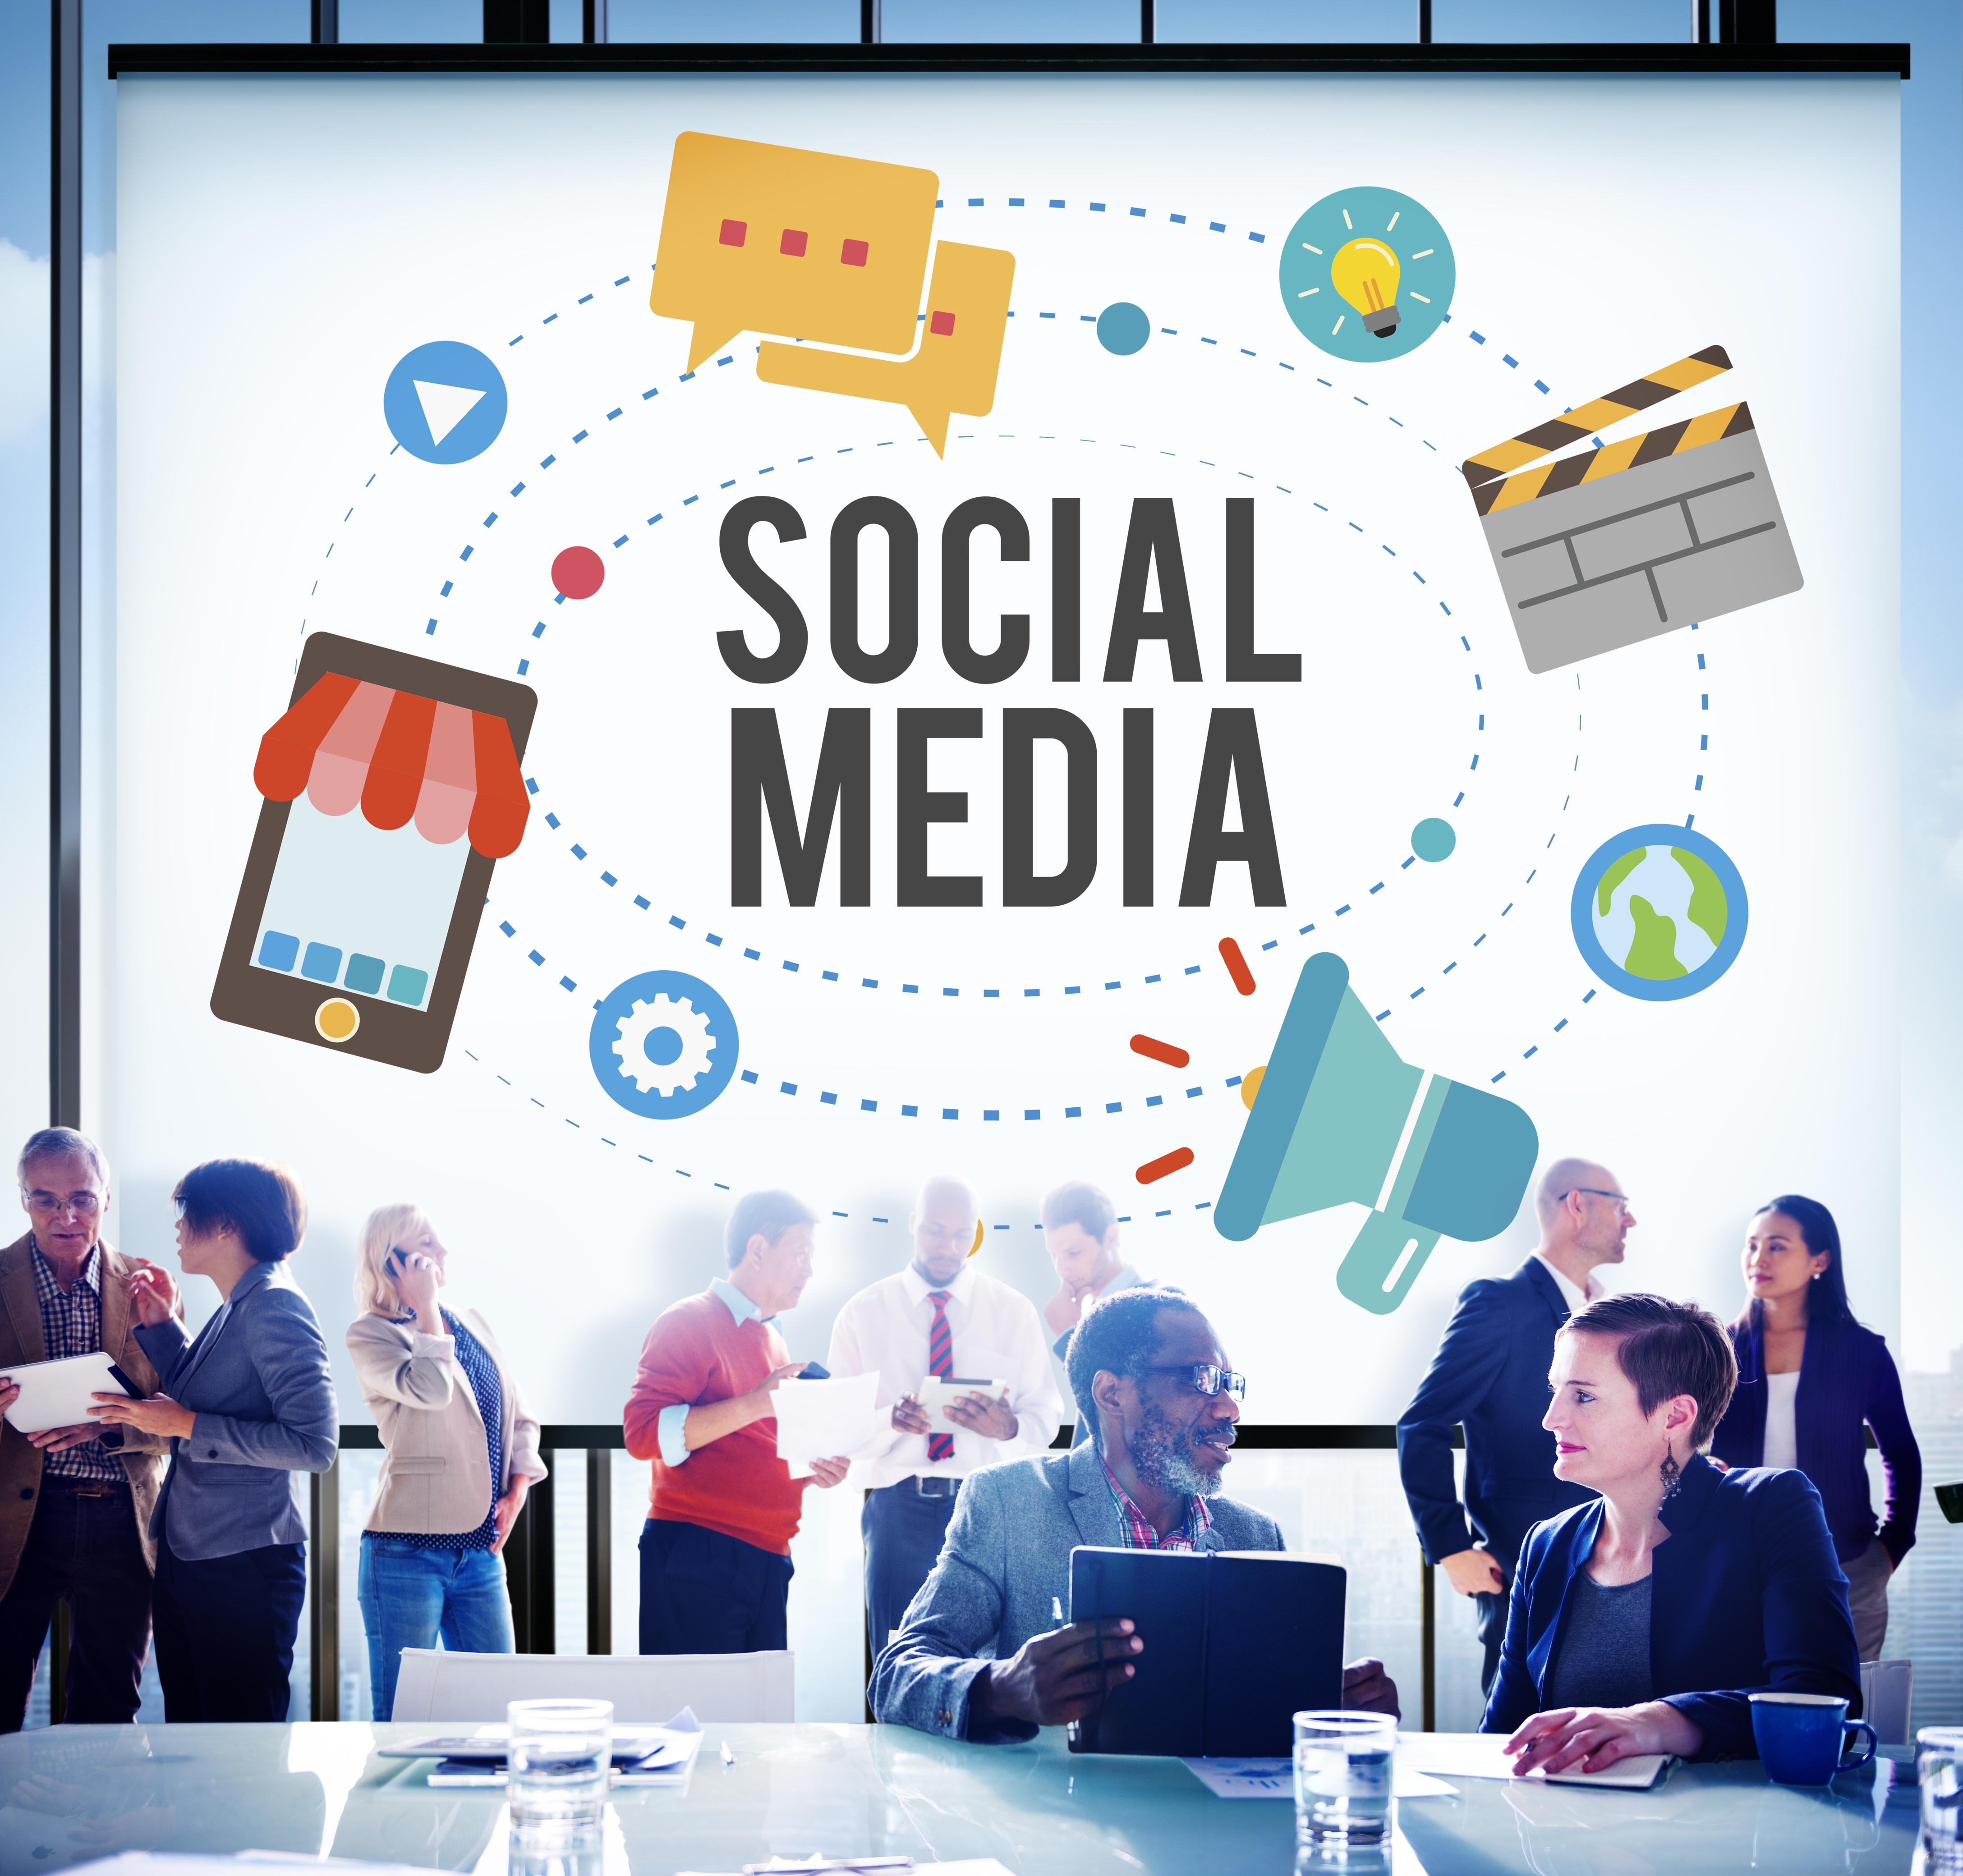 bigstock-Social-Media-Network-Online-In-103822217.jpg